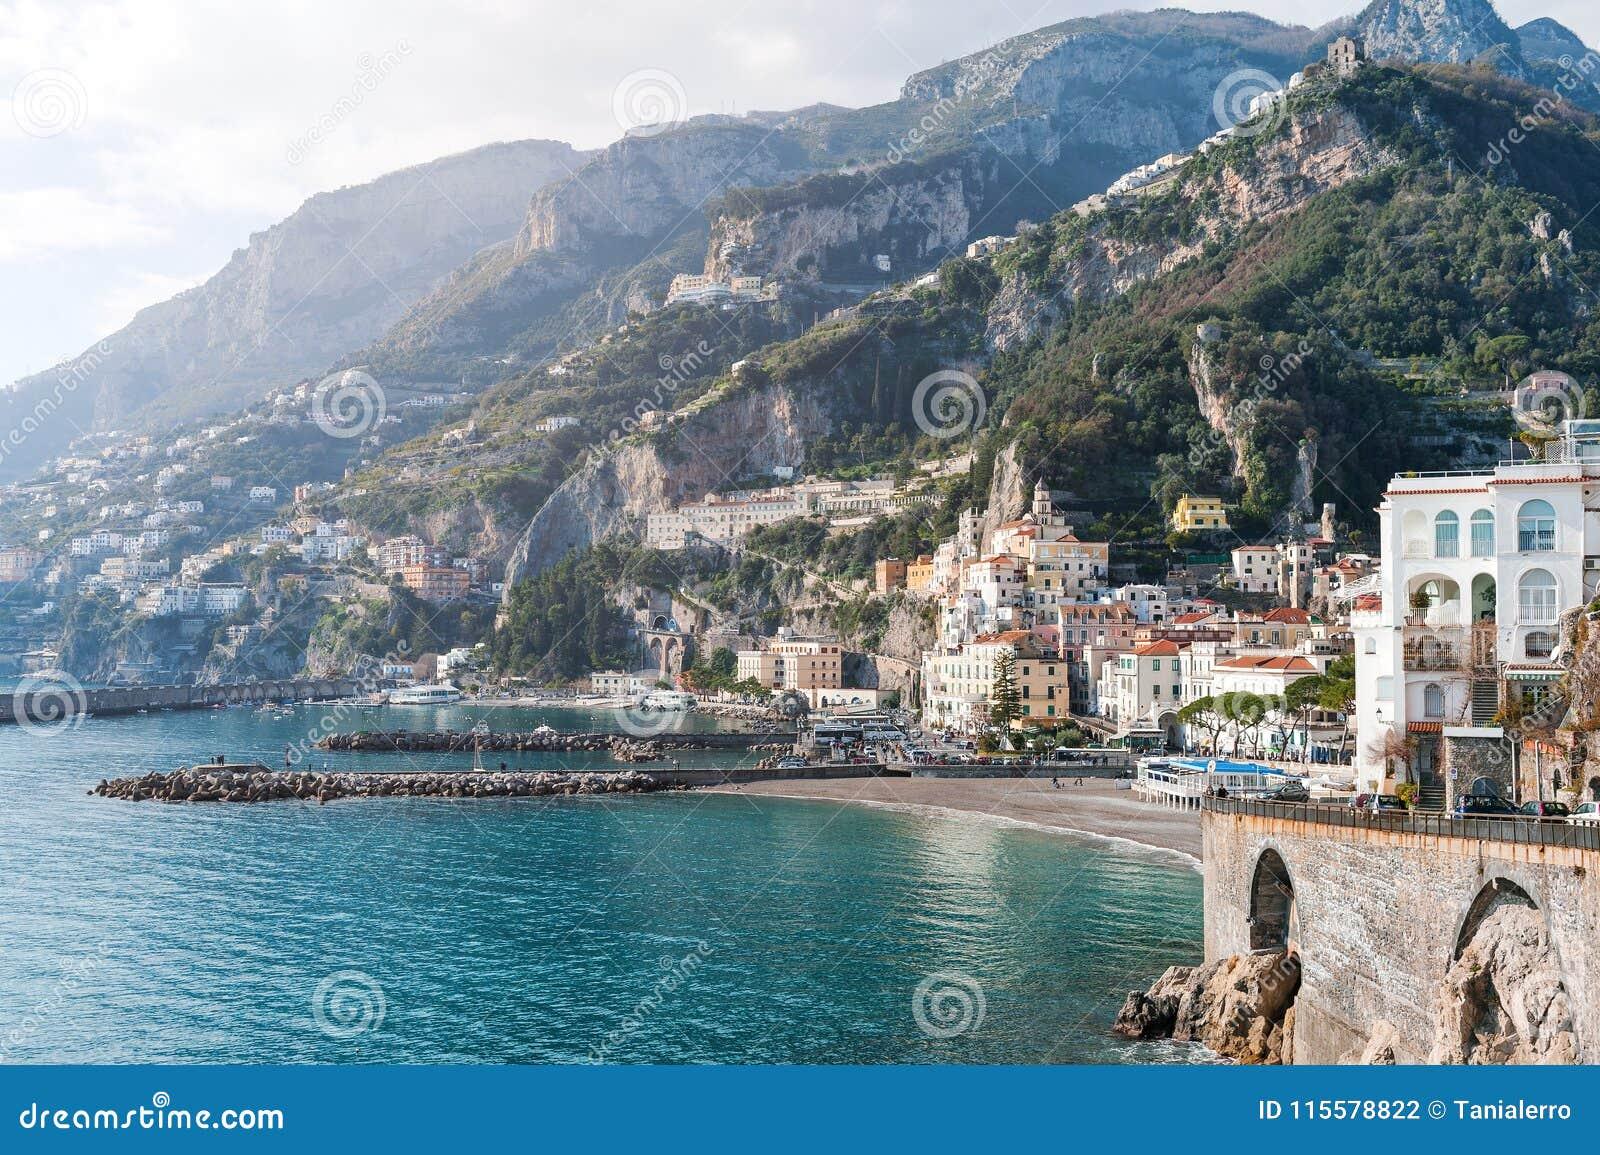 Amalfi overzees, strand en bergen toneelmening - Amalfi kust, Italië, Europa